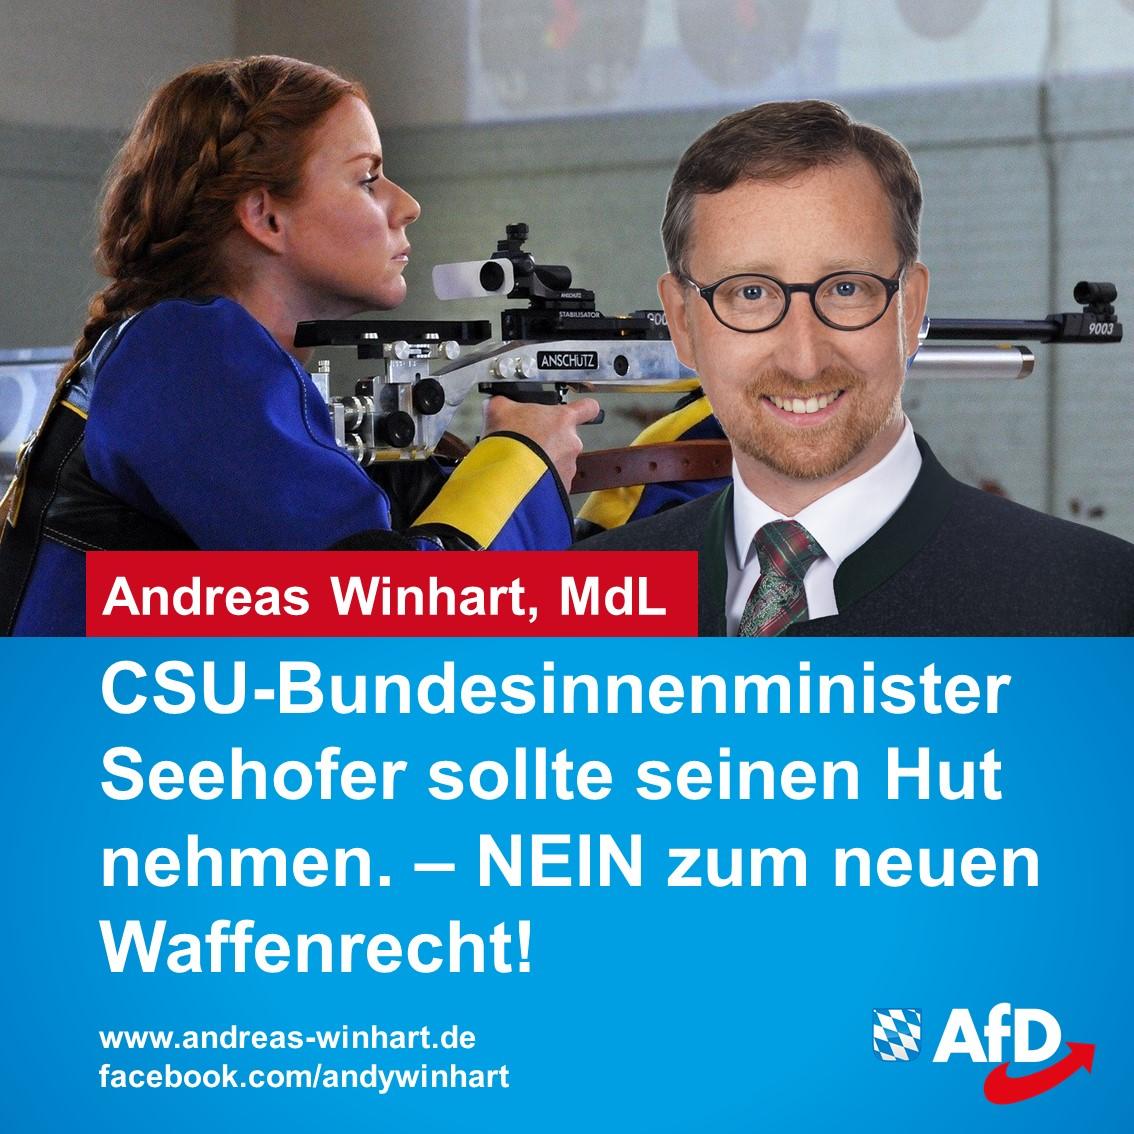 CSU-Bundesinnenminister Seehofer sollte seinen Hut nehmen!